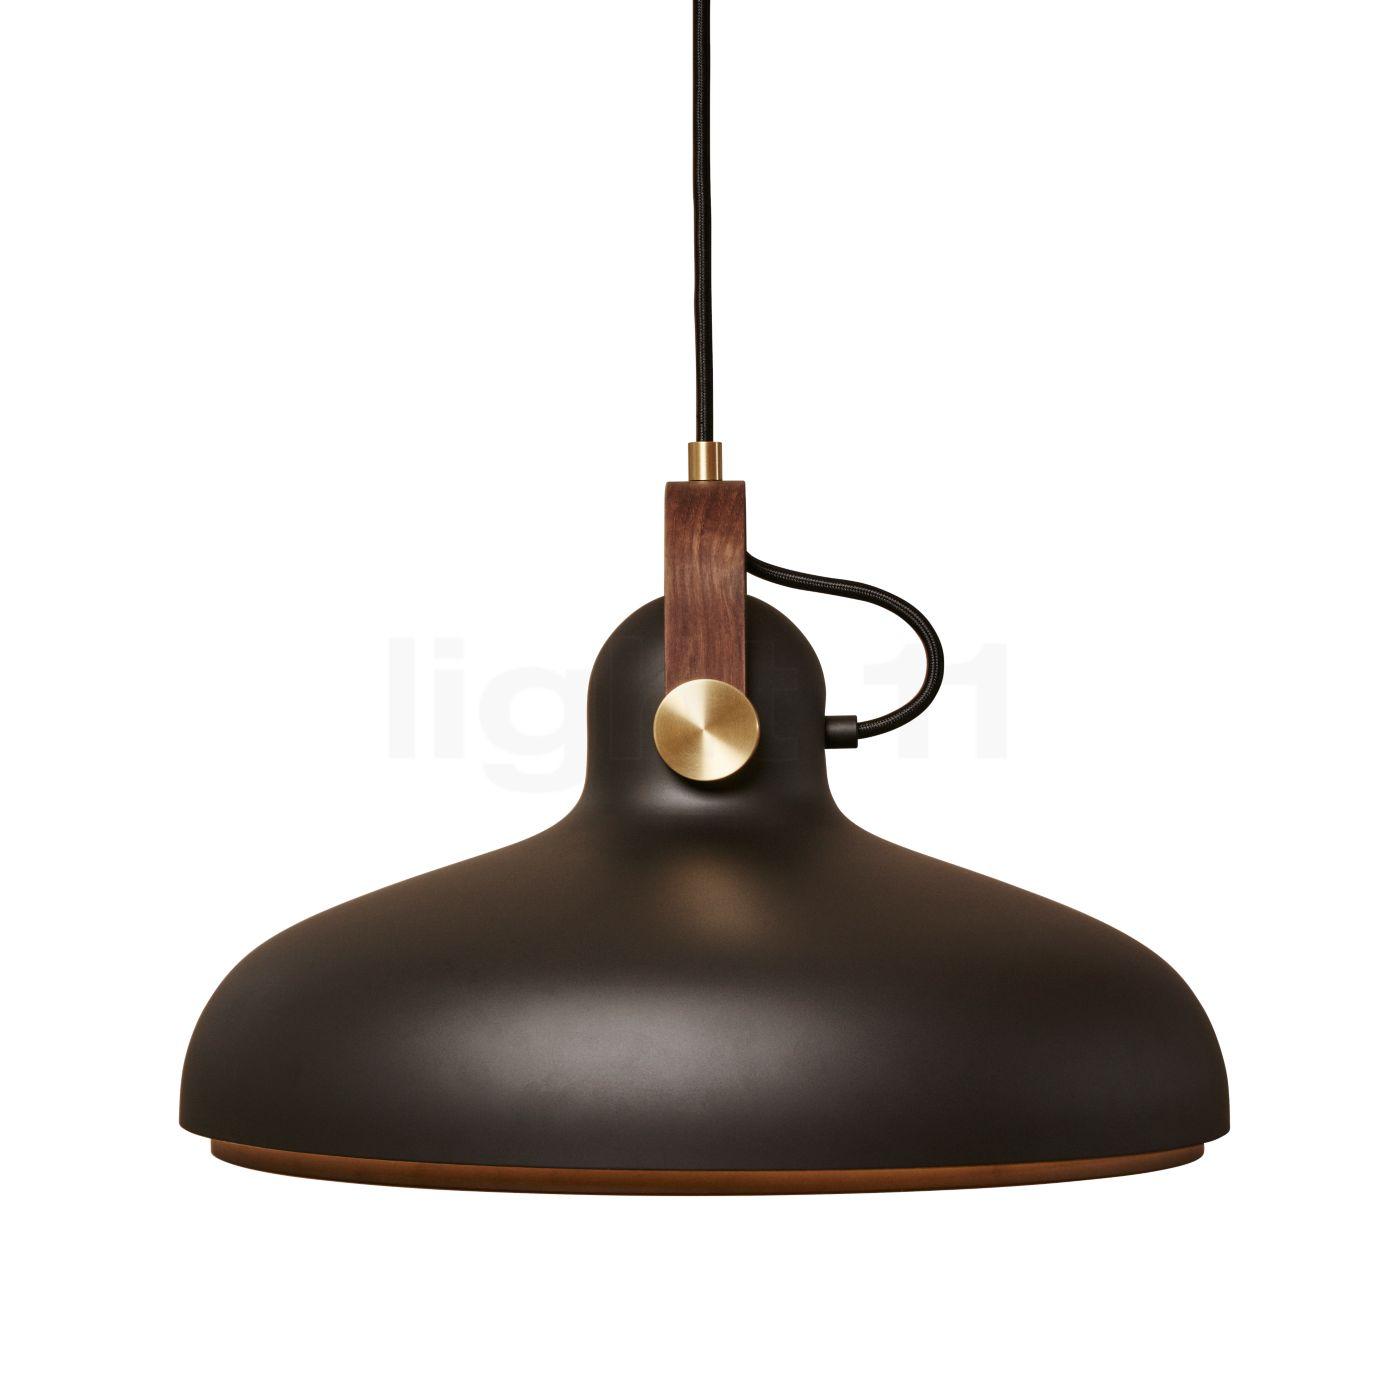 Le Klint Carronade Pendant Light Large Pendant Lights